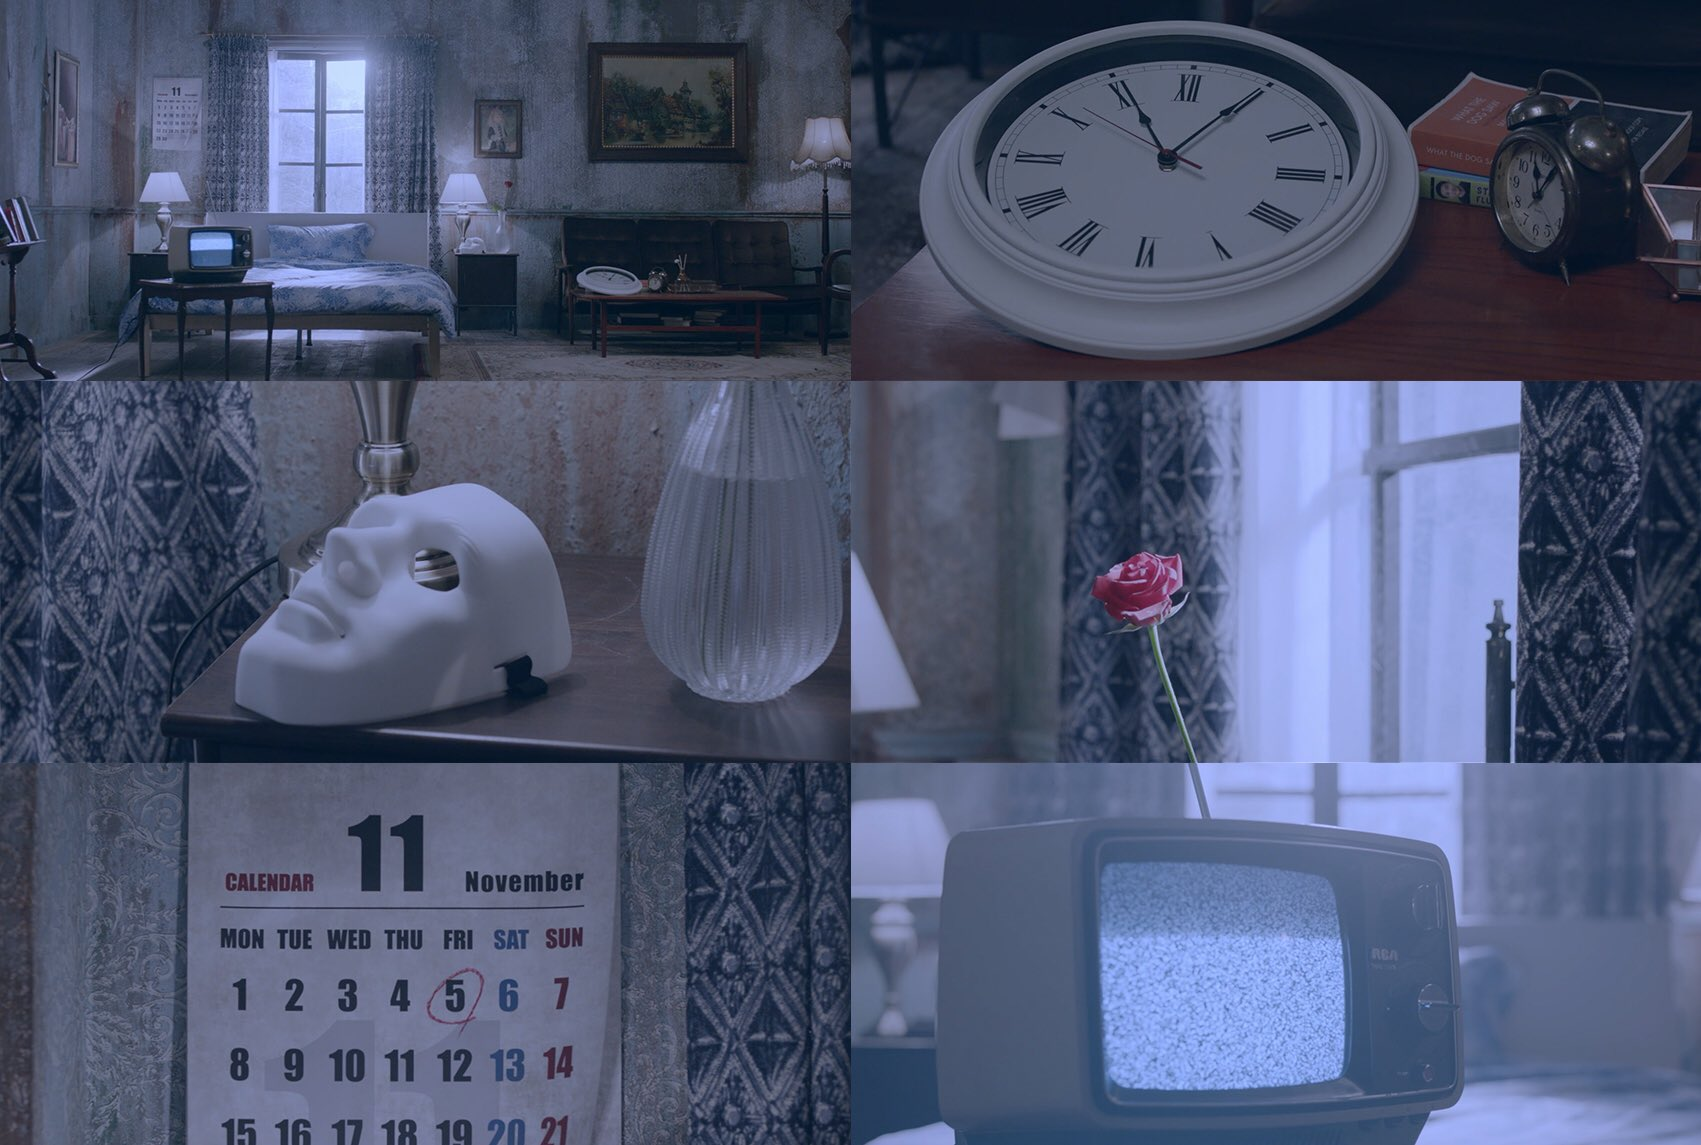 B.A.P, 완전체 컴백 'WAKE ME UP' 뮤직비디오 스포 https://t.co/lFGVEAEvLJ https://t.co/gdKYksmD8K